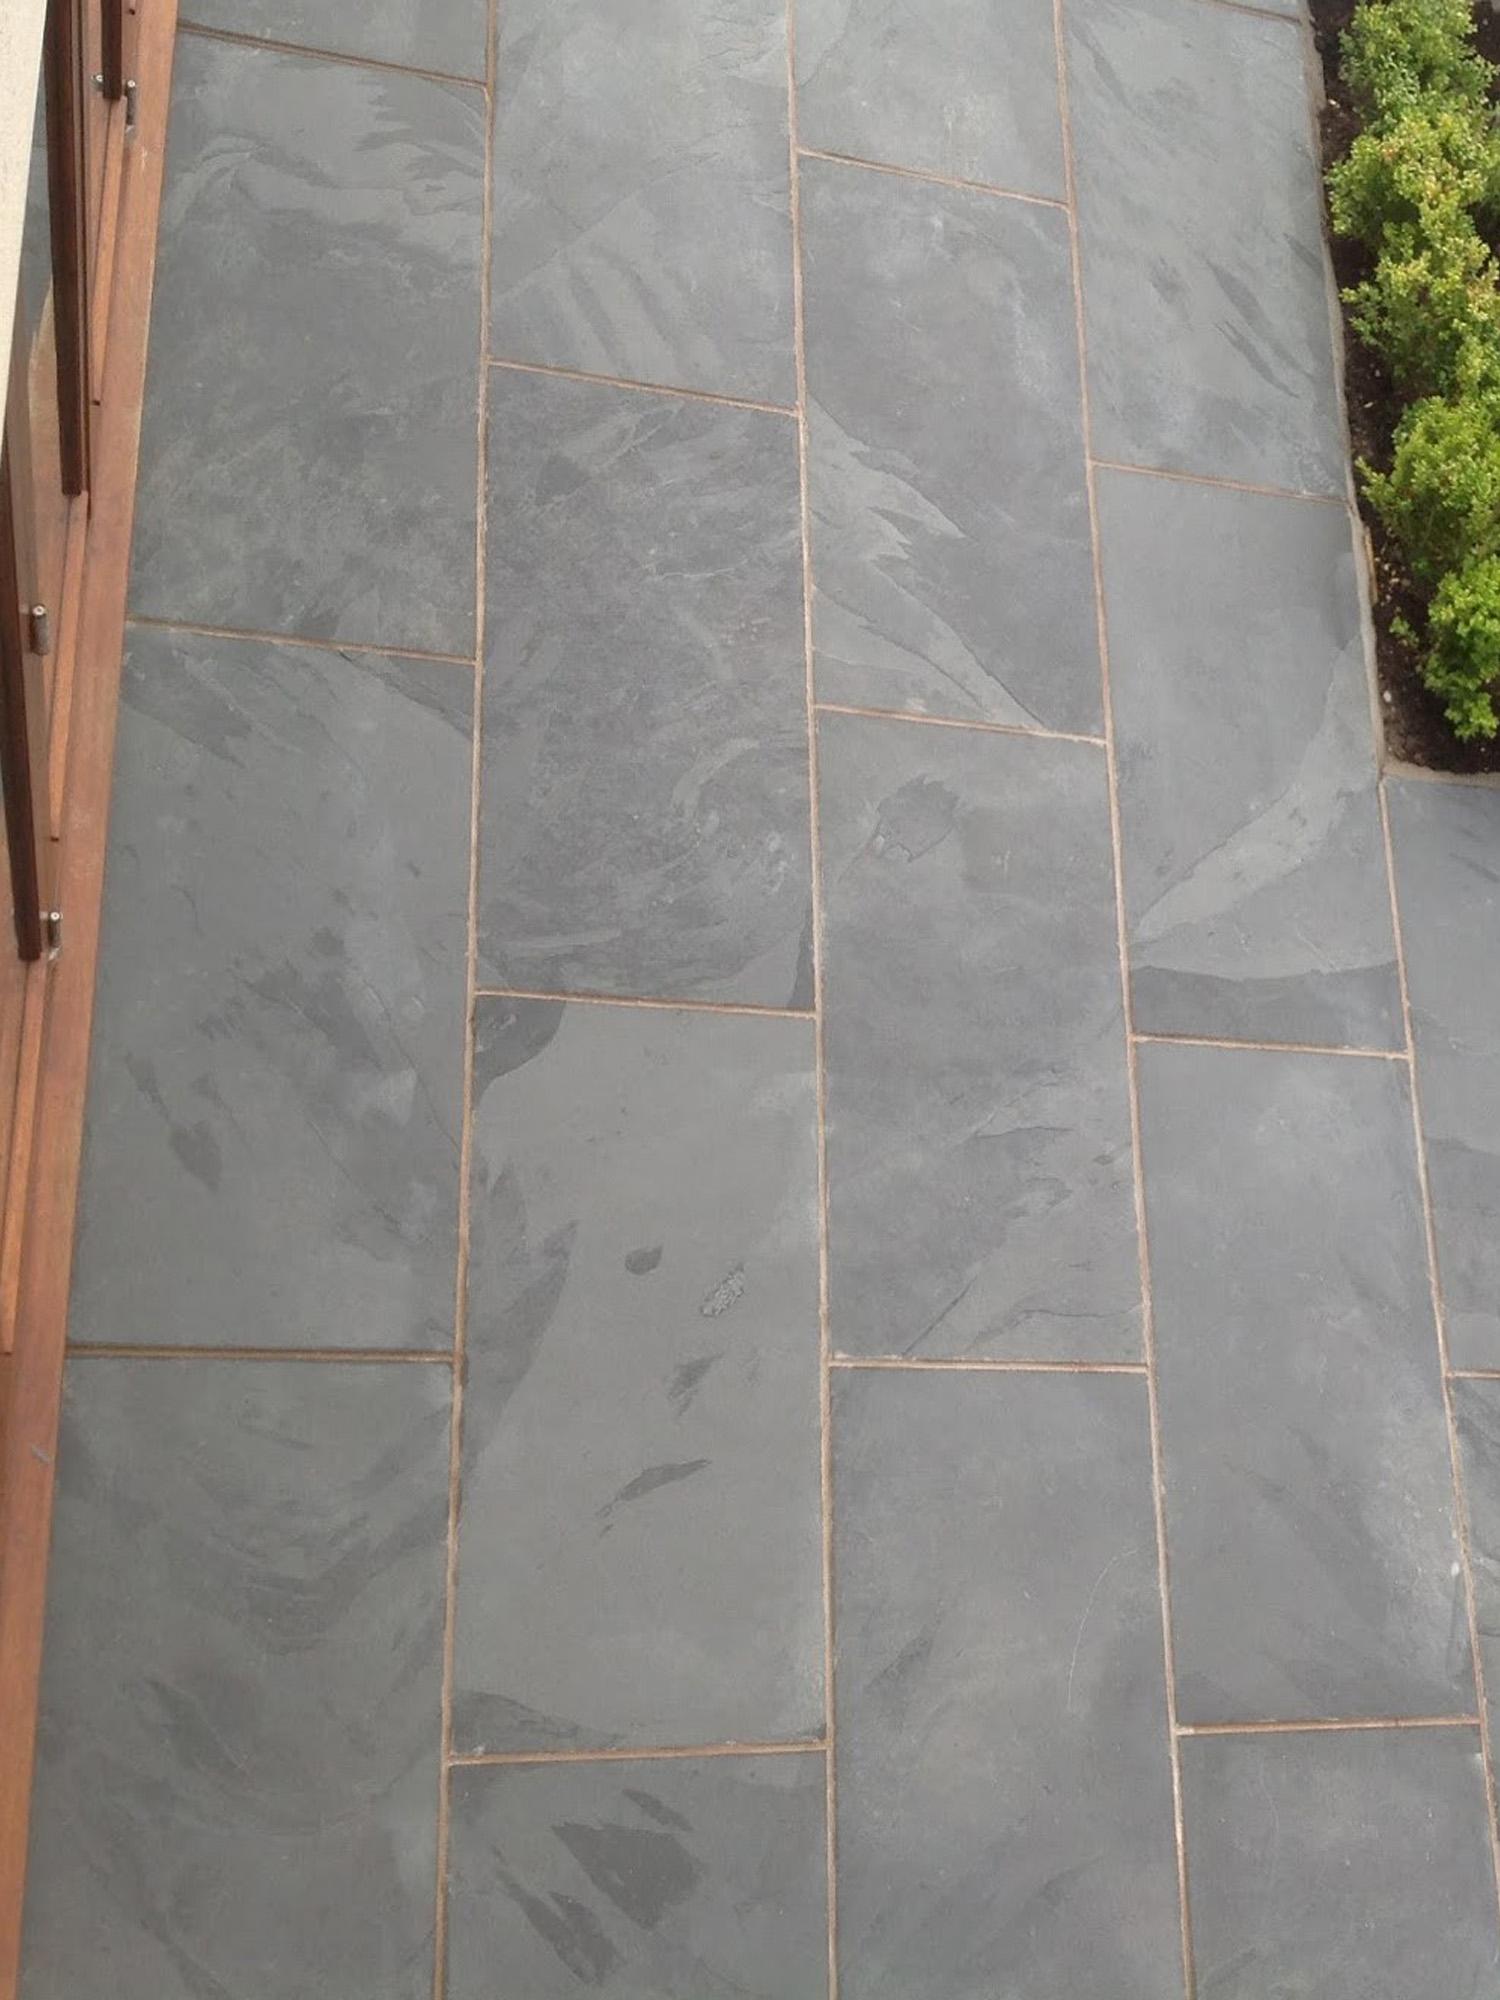 Unusual 12 By 12 Ceiling Tiles Small 17 X 17 Floor Tile Solid 24X24 Ceiling Tiles 3 X 6 Beveled Subway Tile Young 3X3 Ceramic Tile Dark8X8 Floor Tile Royale Stones, Brazil Black Slate Paving Slabs   1200x600